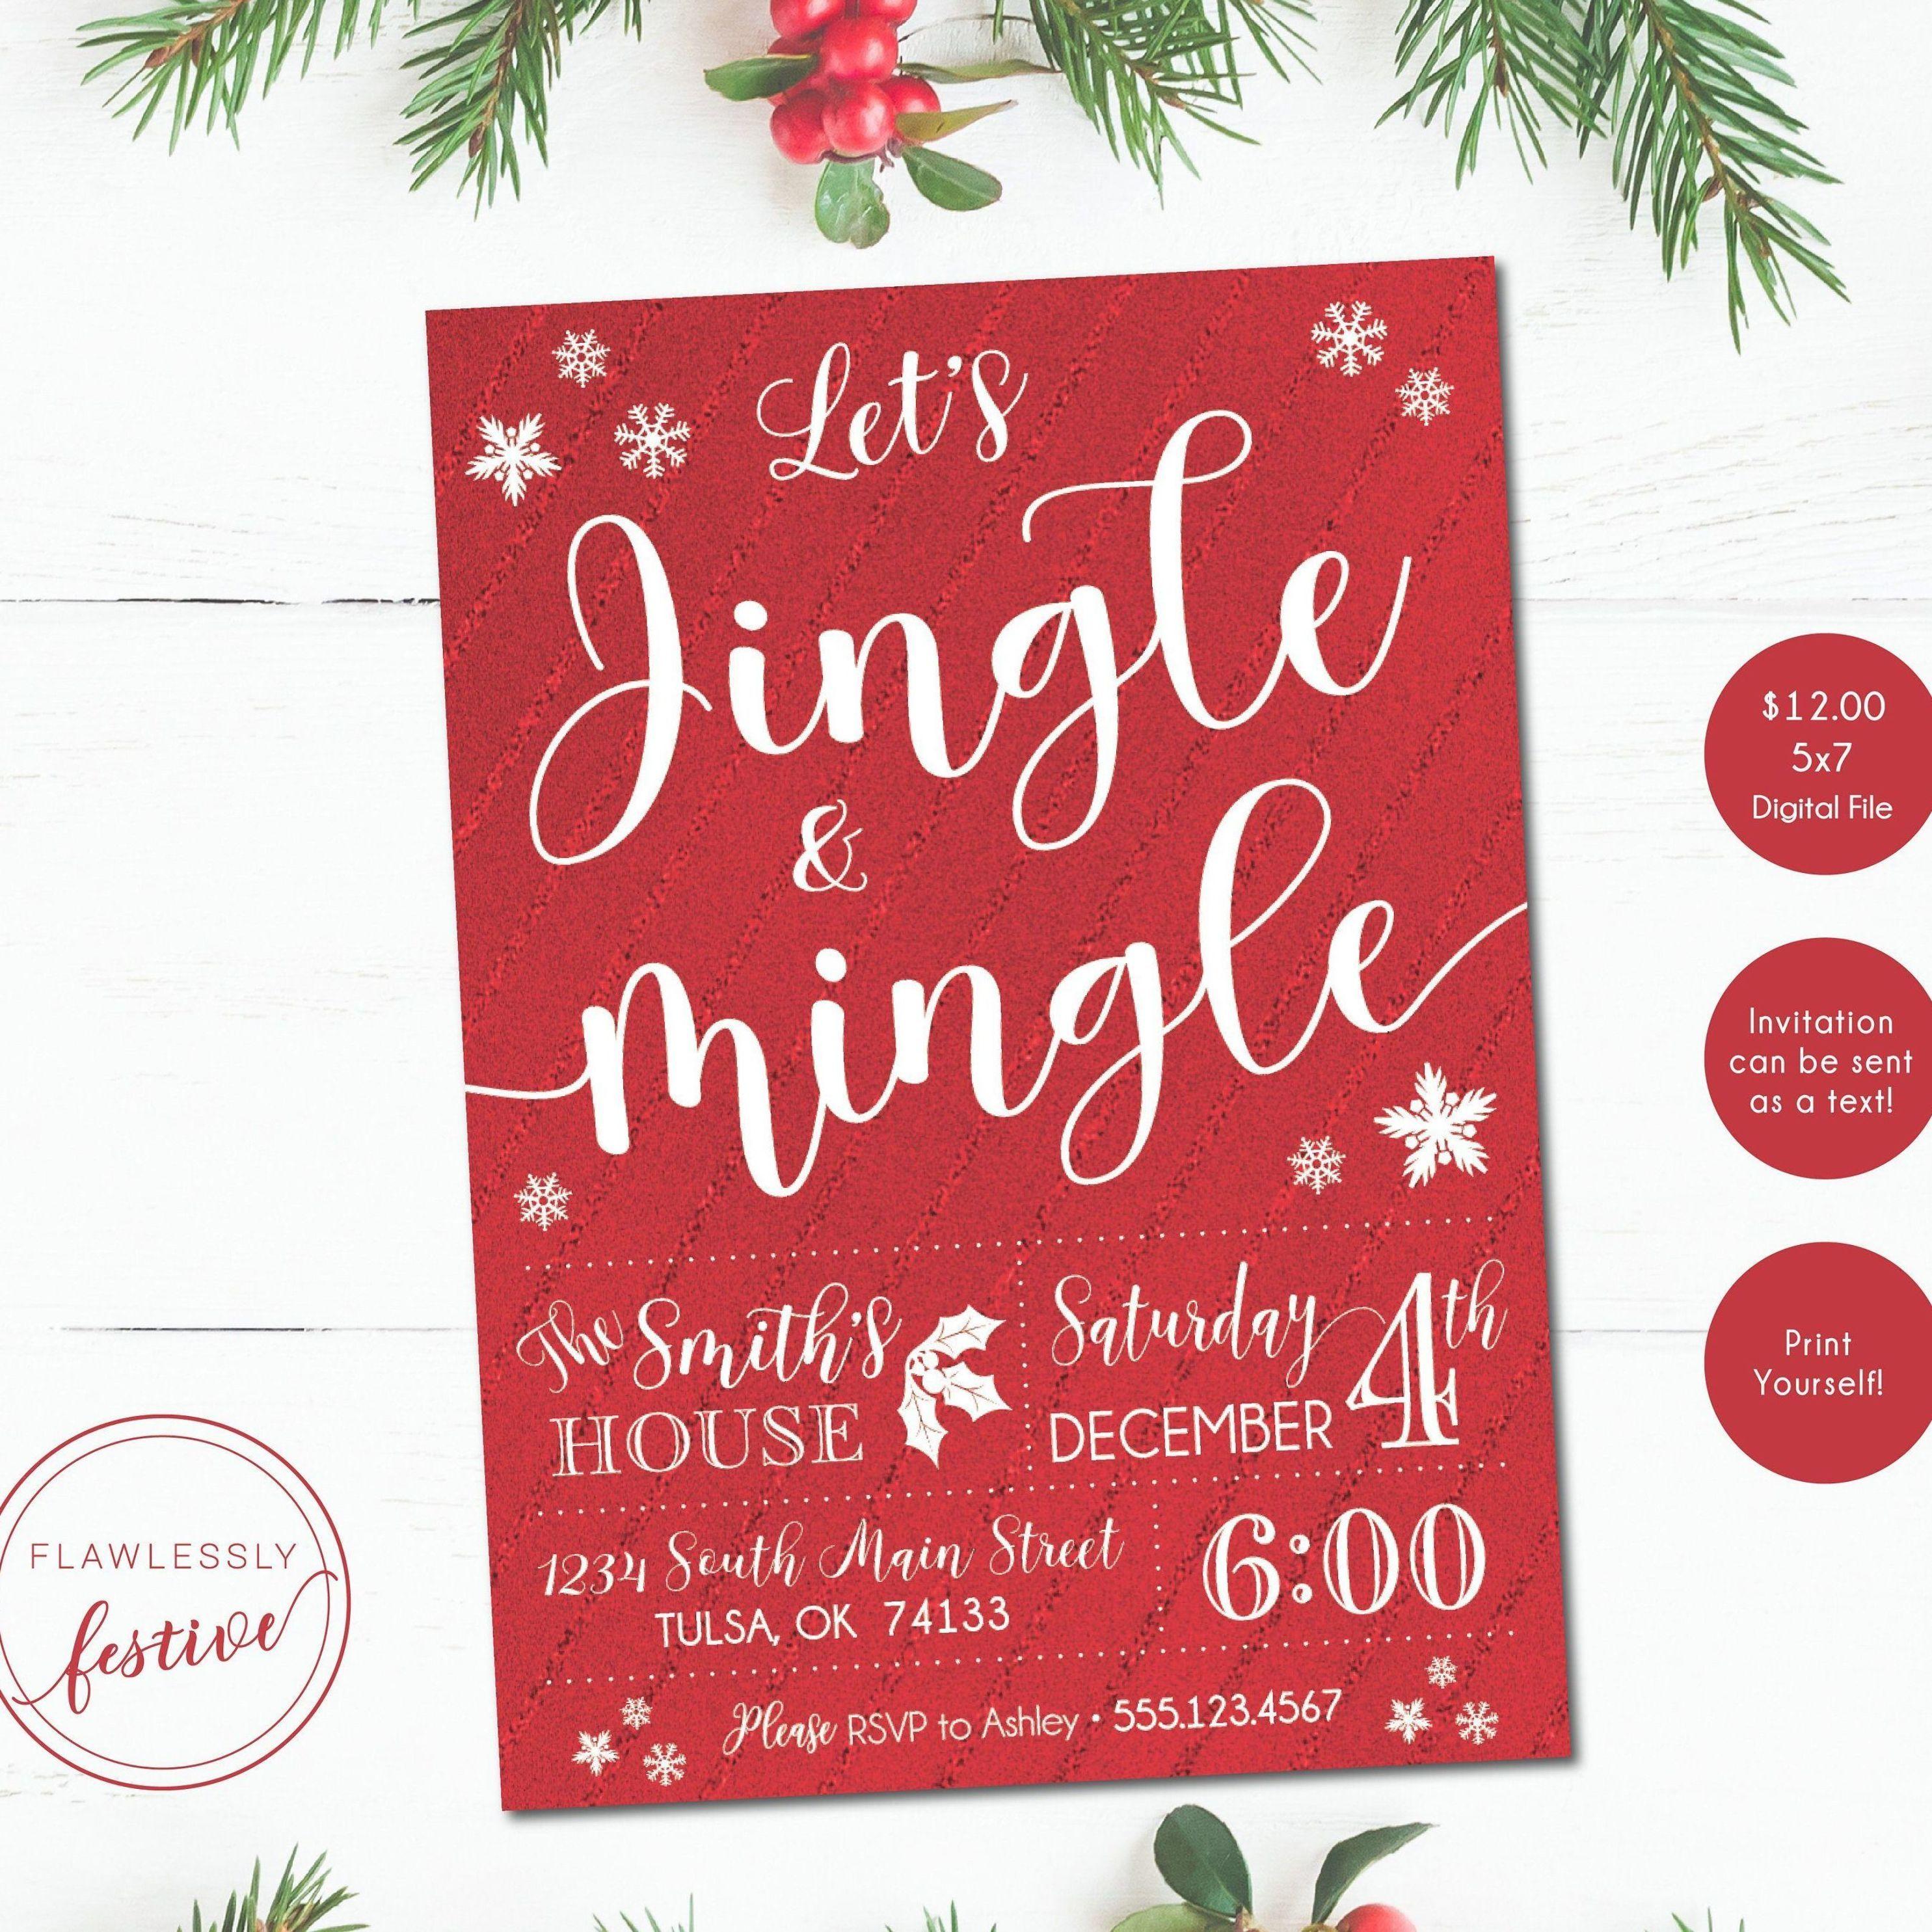 Jingle and Mingle Invitation • Christmas Party Invitation #christmasparty #invitation #christmasinvitation #mingleandjingle #jingleandmingle #christmaspartyideas #christmaspartyinvitation